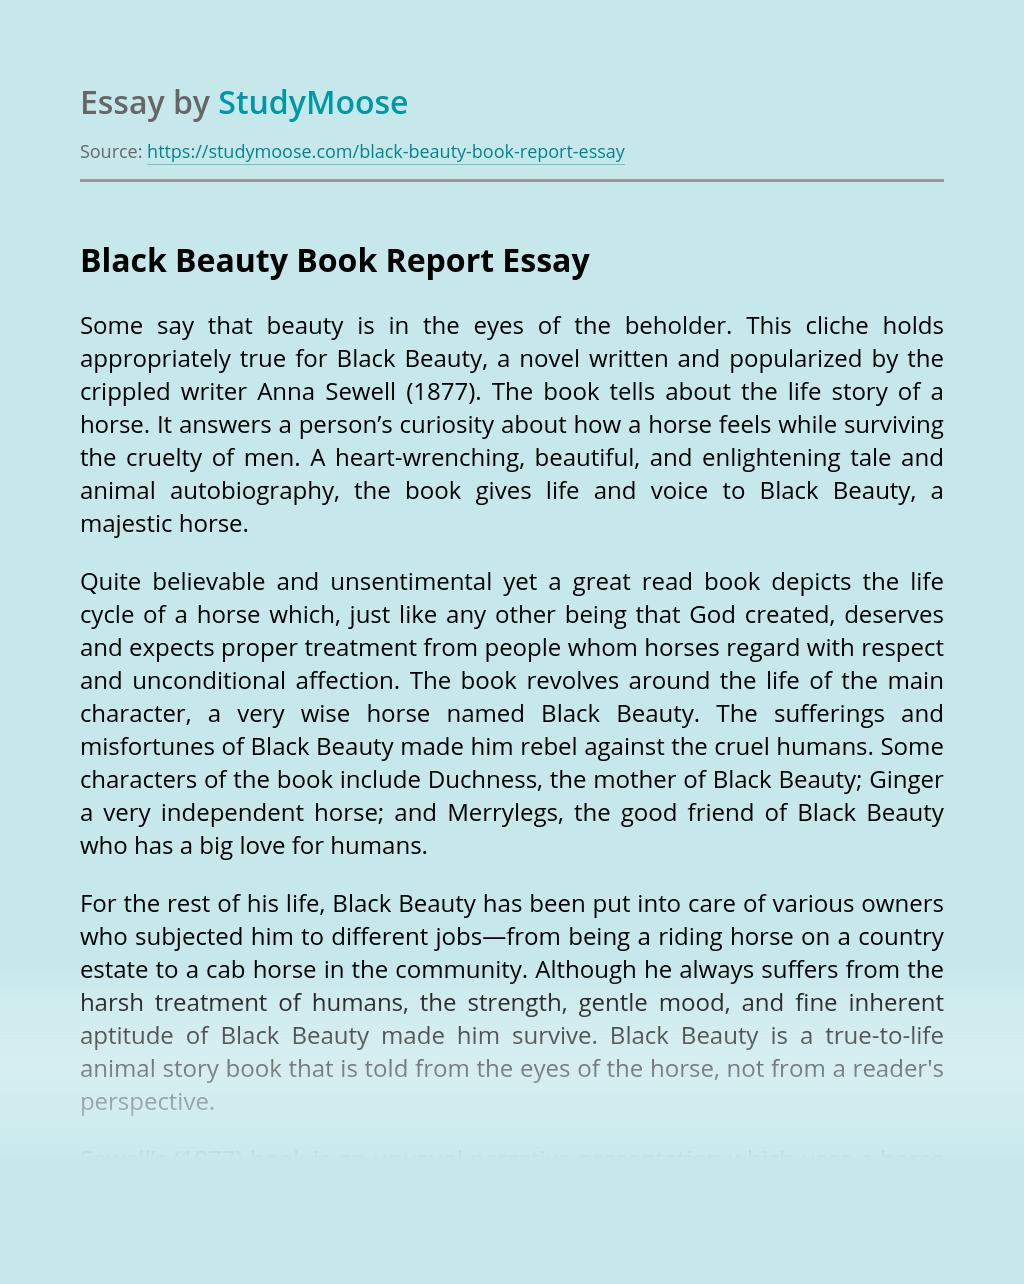 Black Beauty Book Report